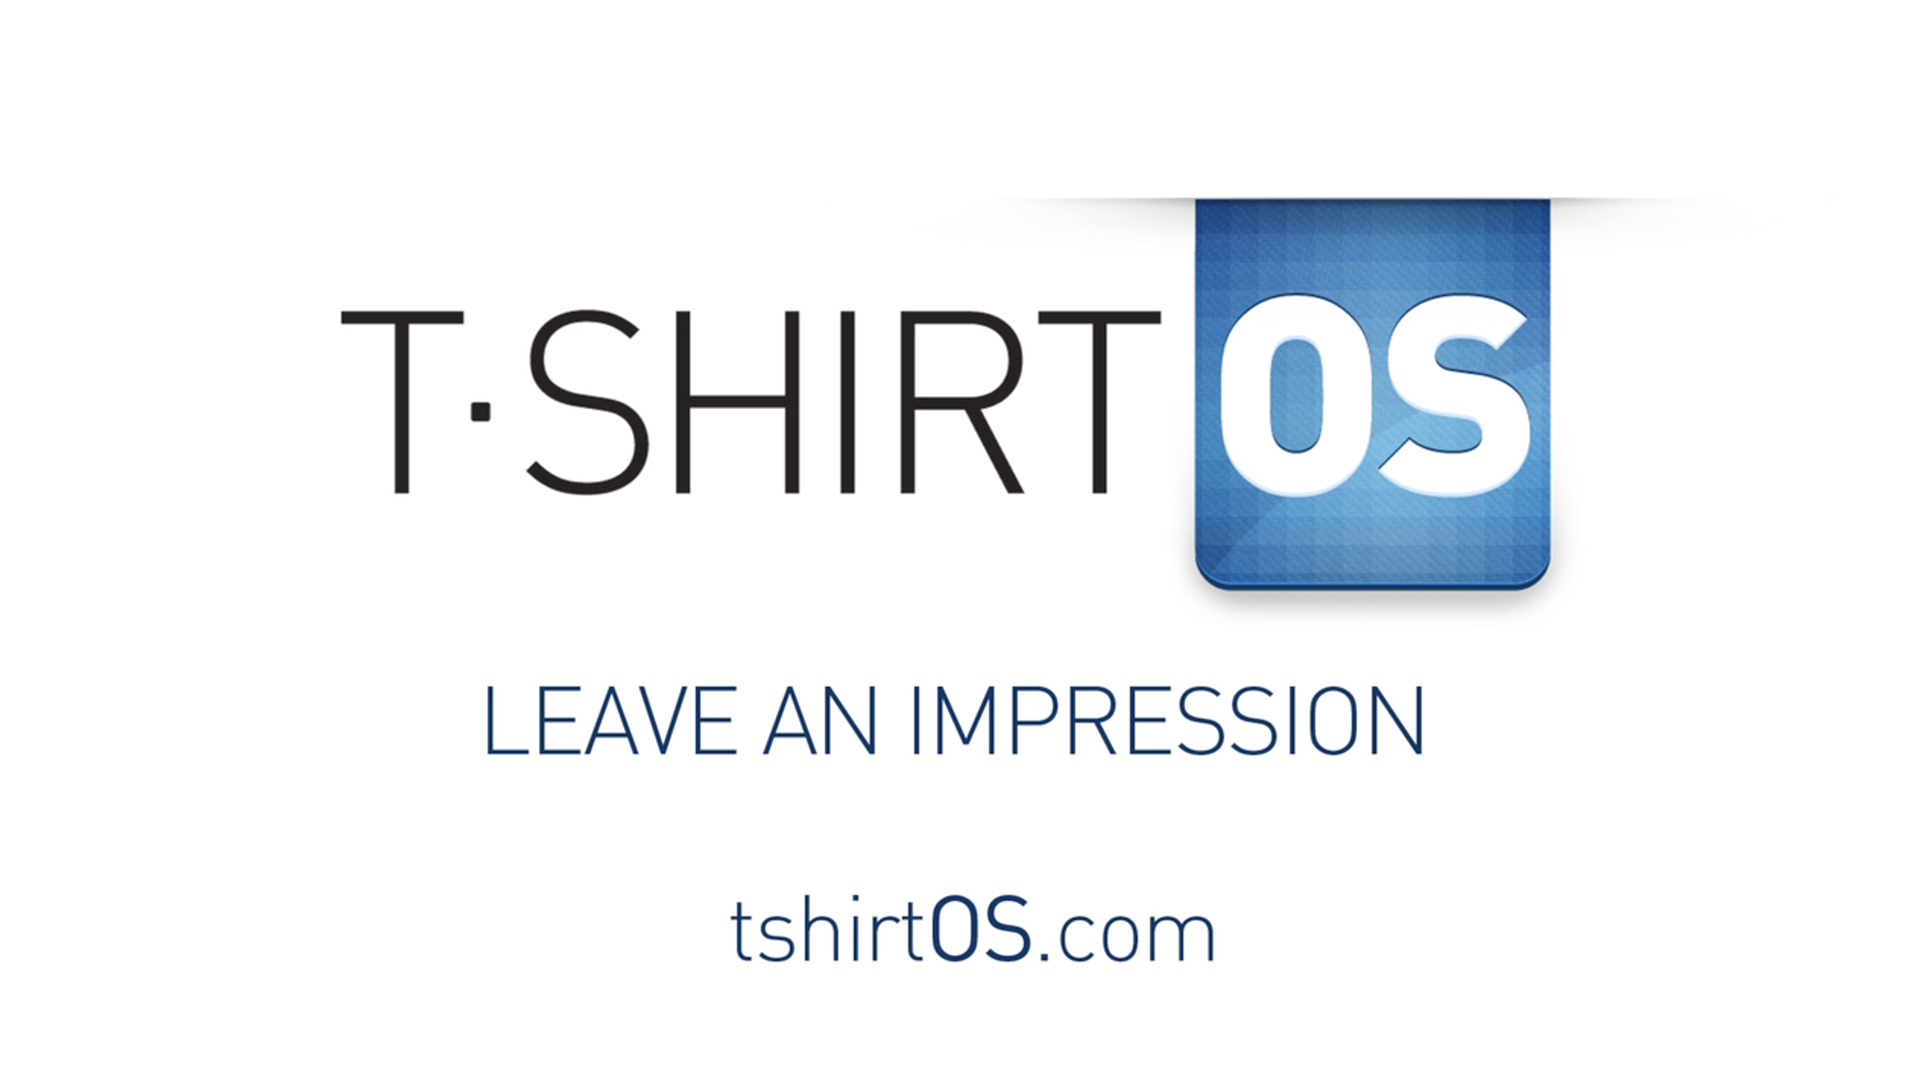 T-shirt OS.jpg